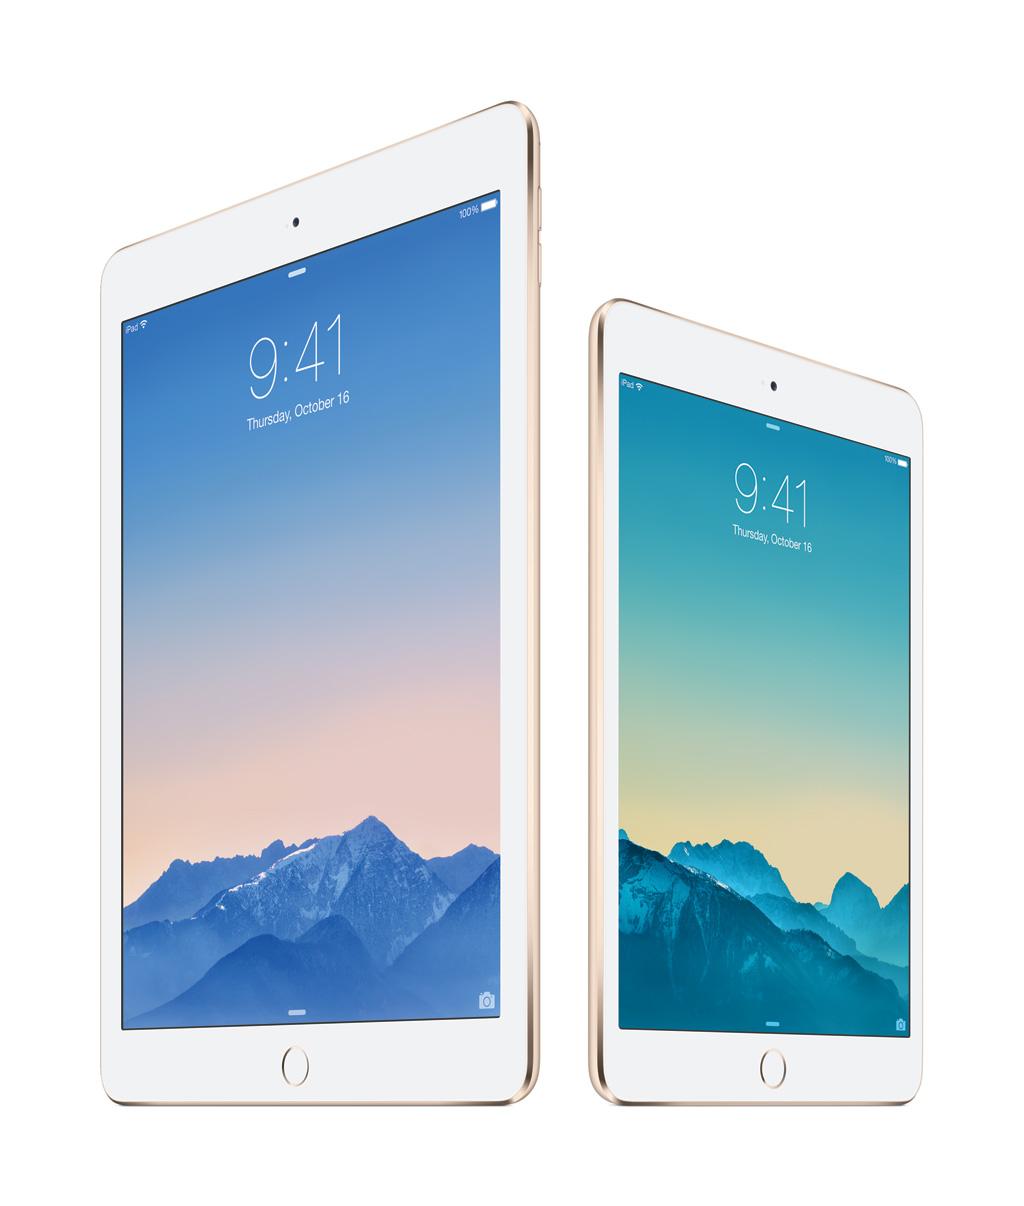 Apple iPad Air 2 & iPad mini 3